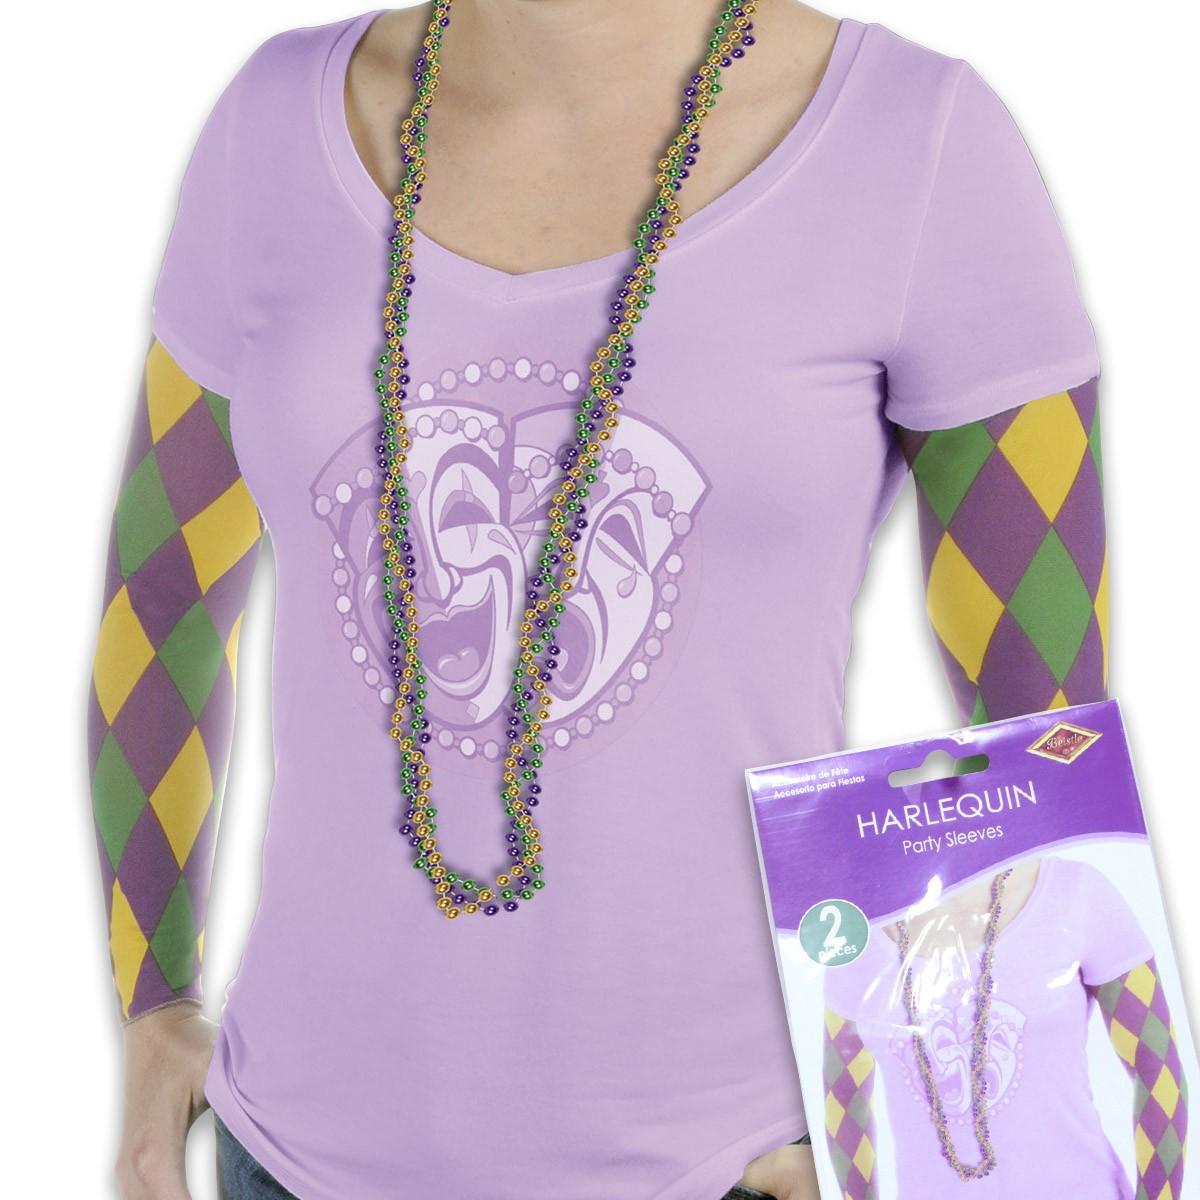 Mardi Gras Party Sleeves